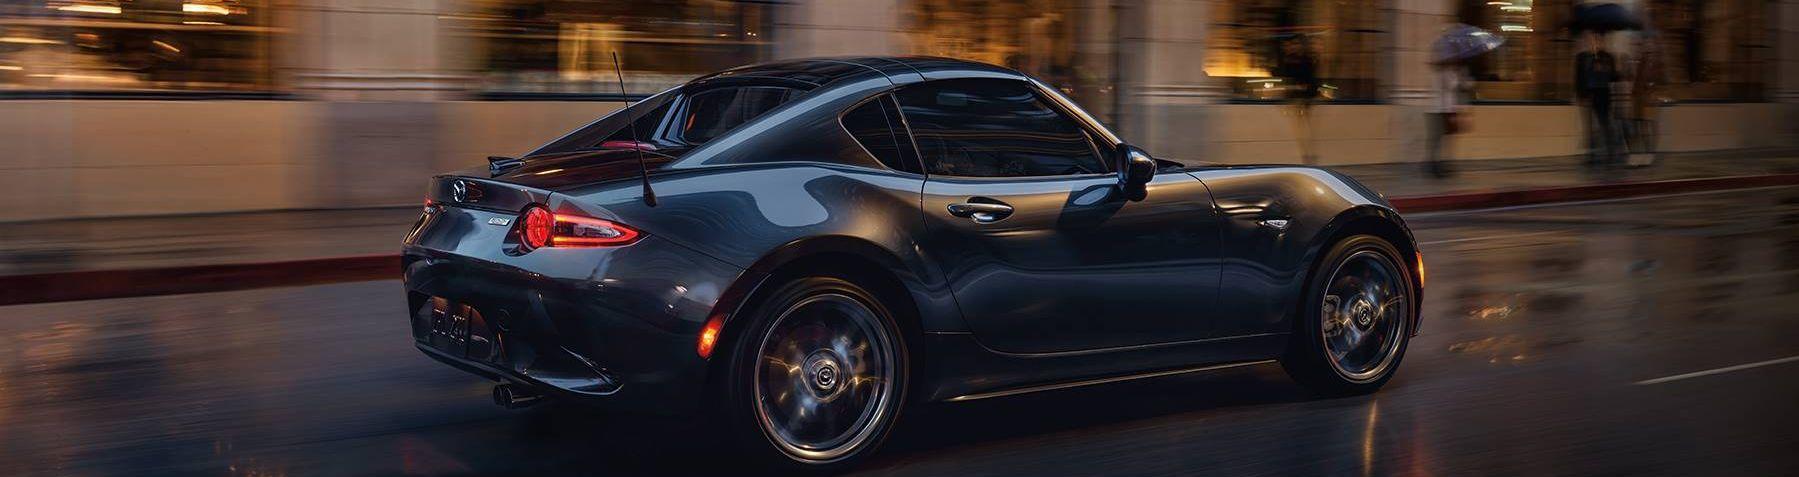 2019 Mazda MX-5 Miata RF for Sale near Killeen, TX